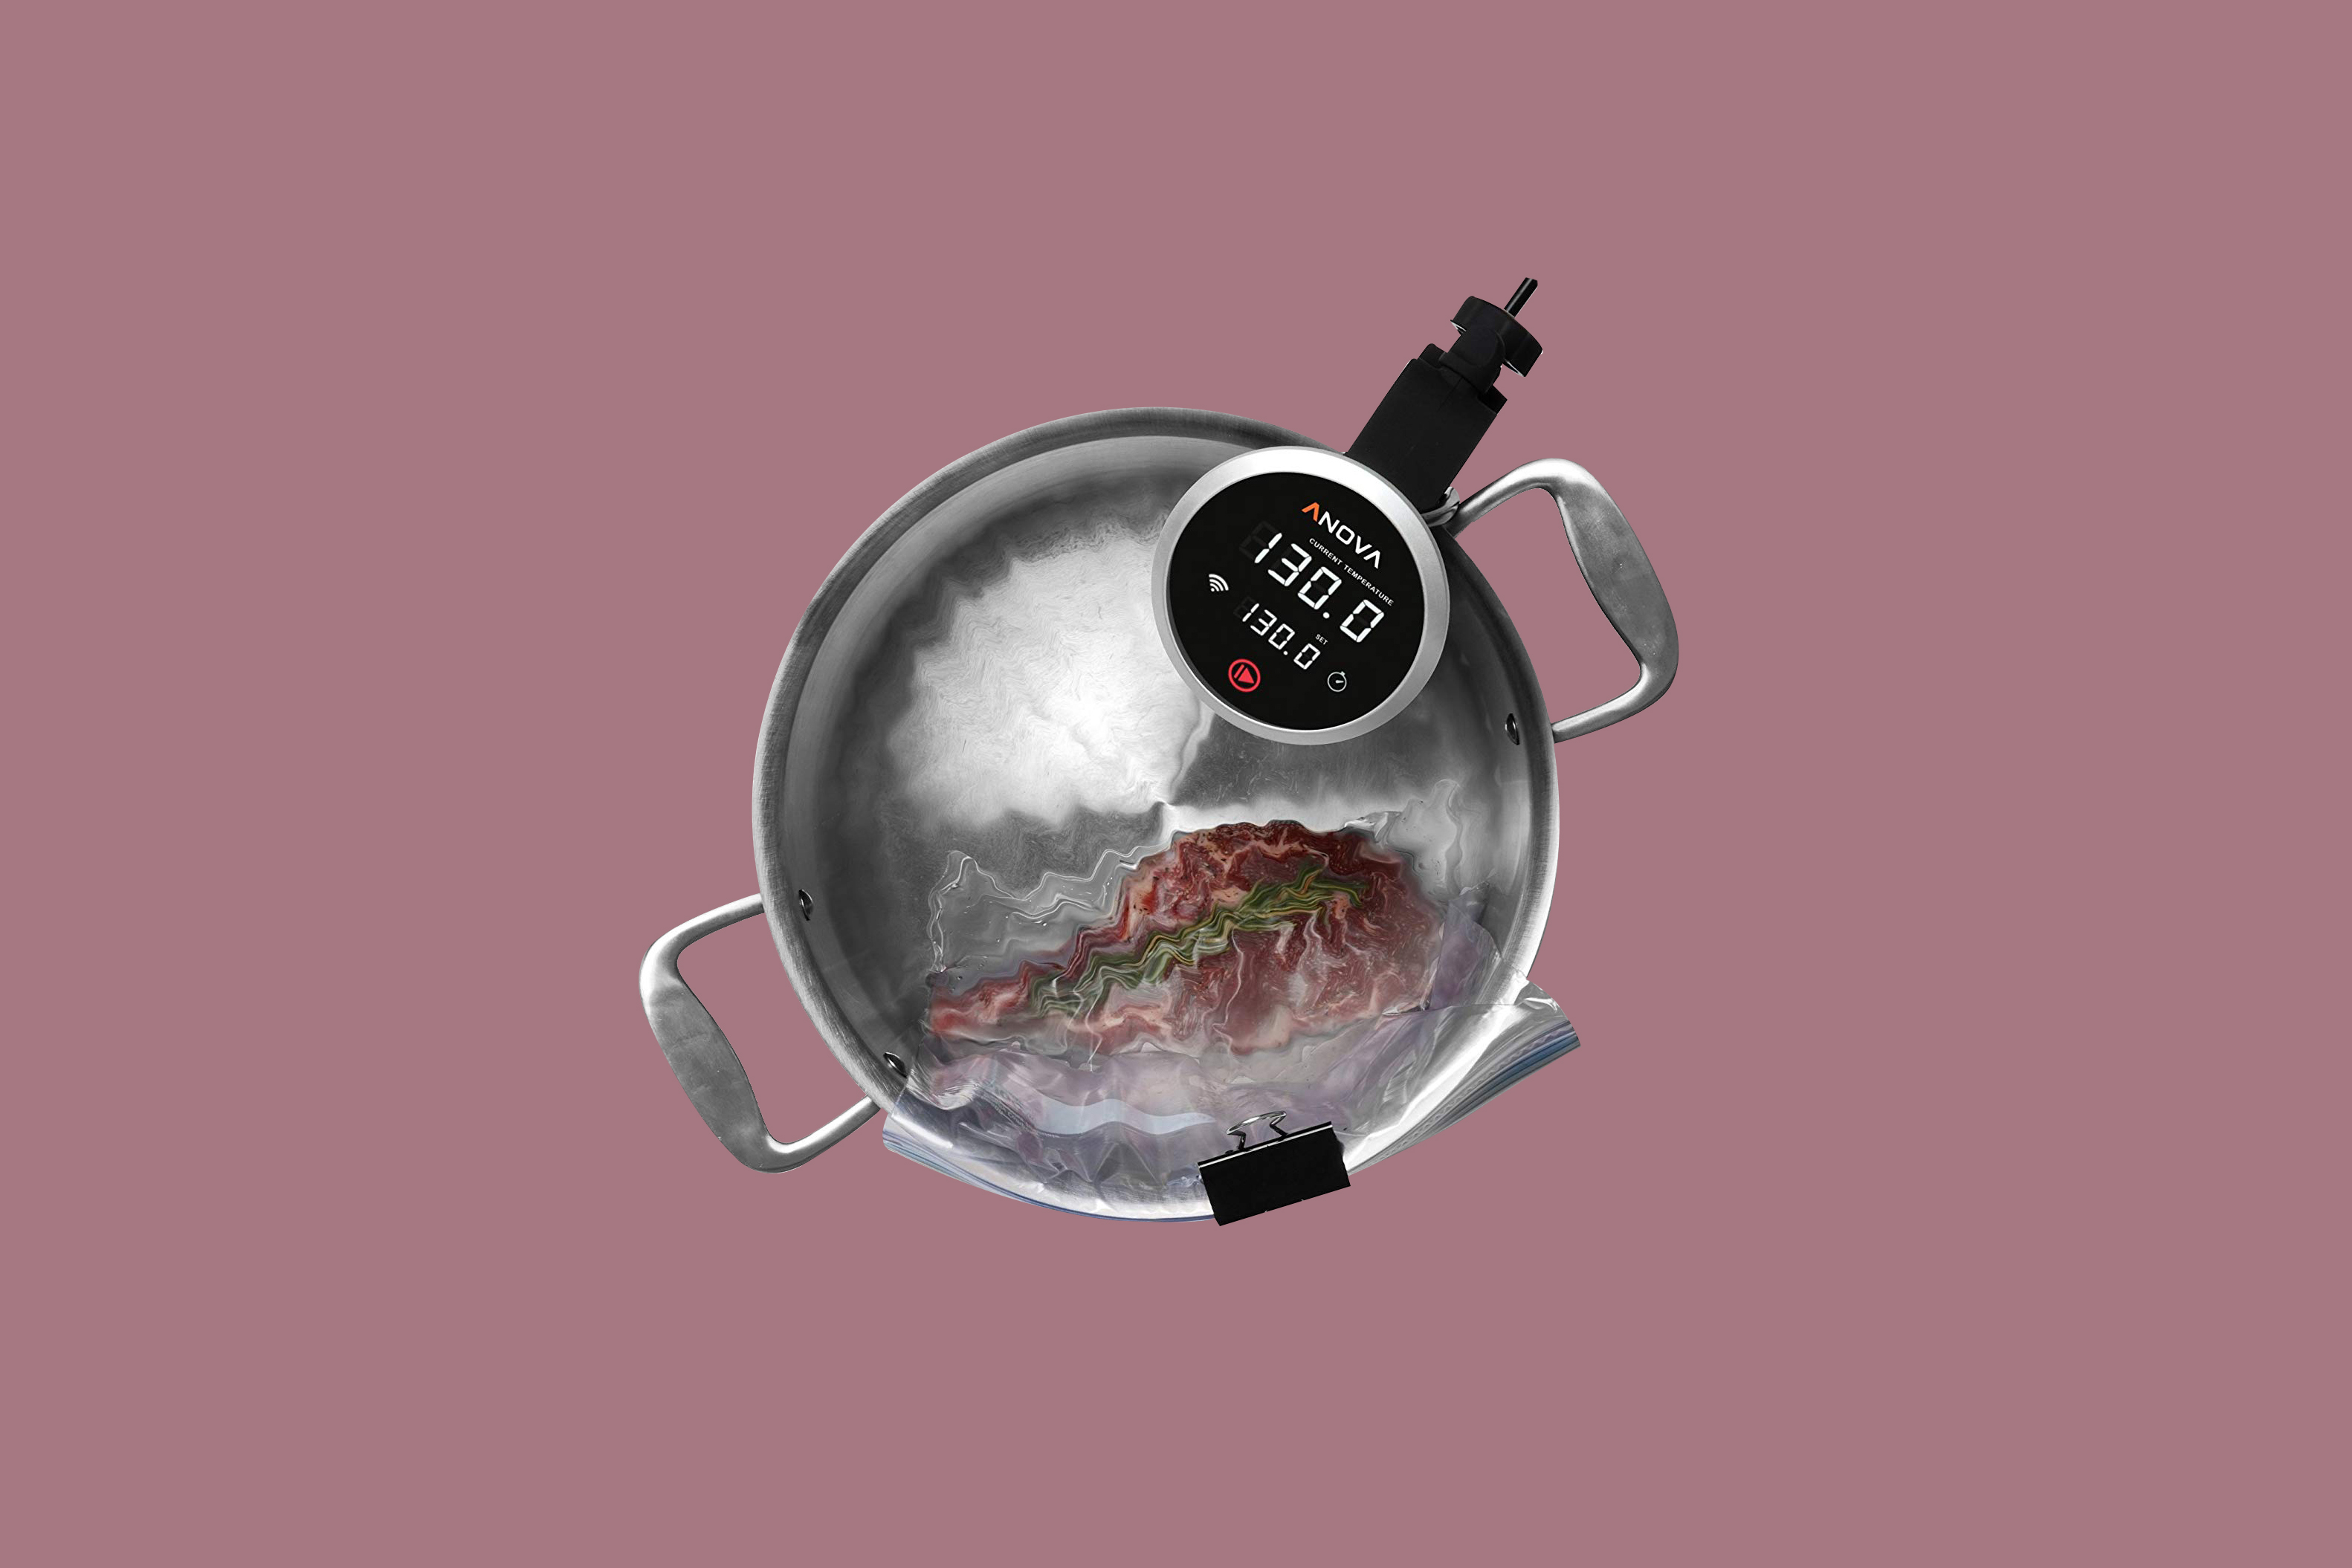 anova culinary sous vide precision cooker